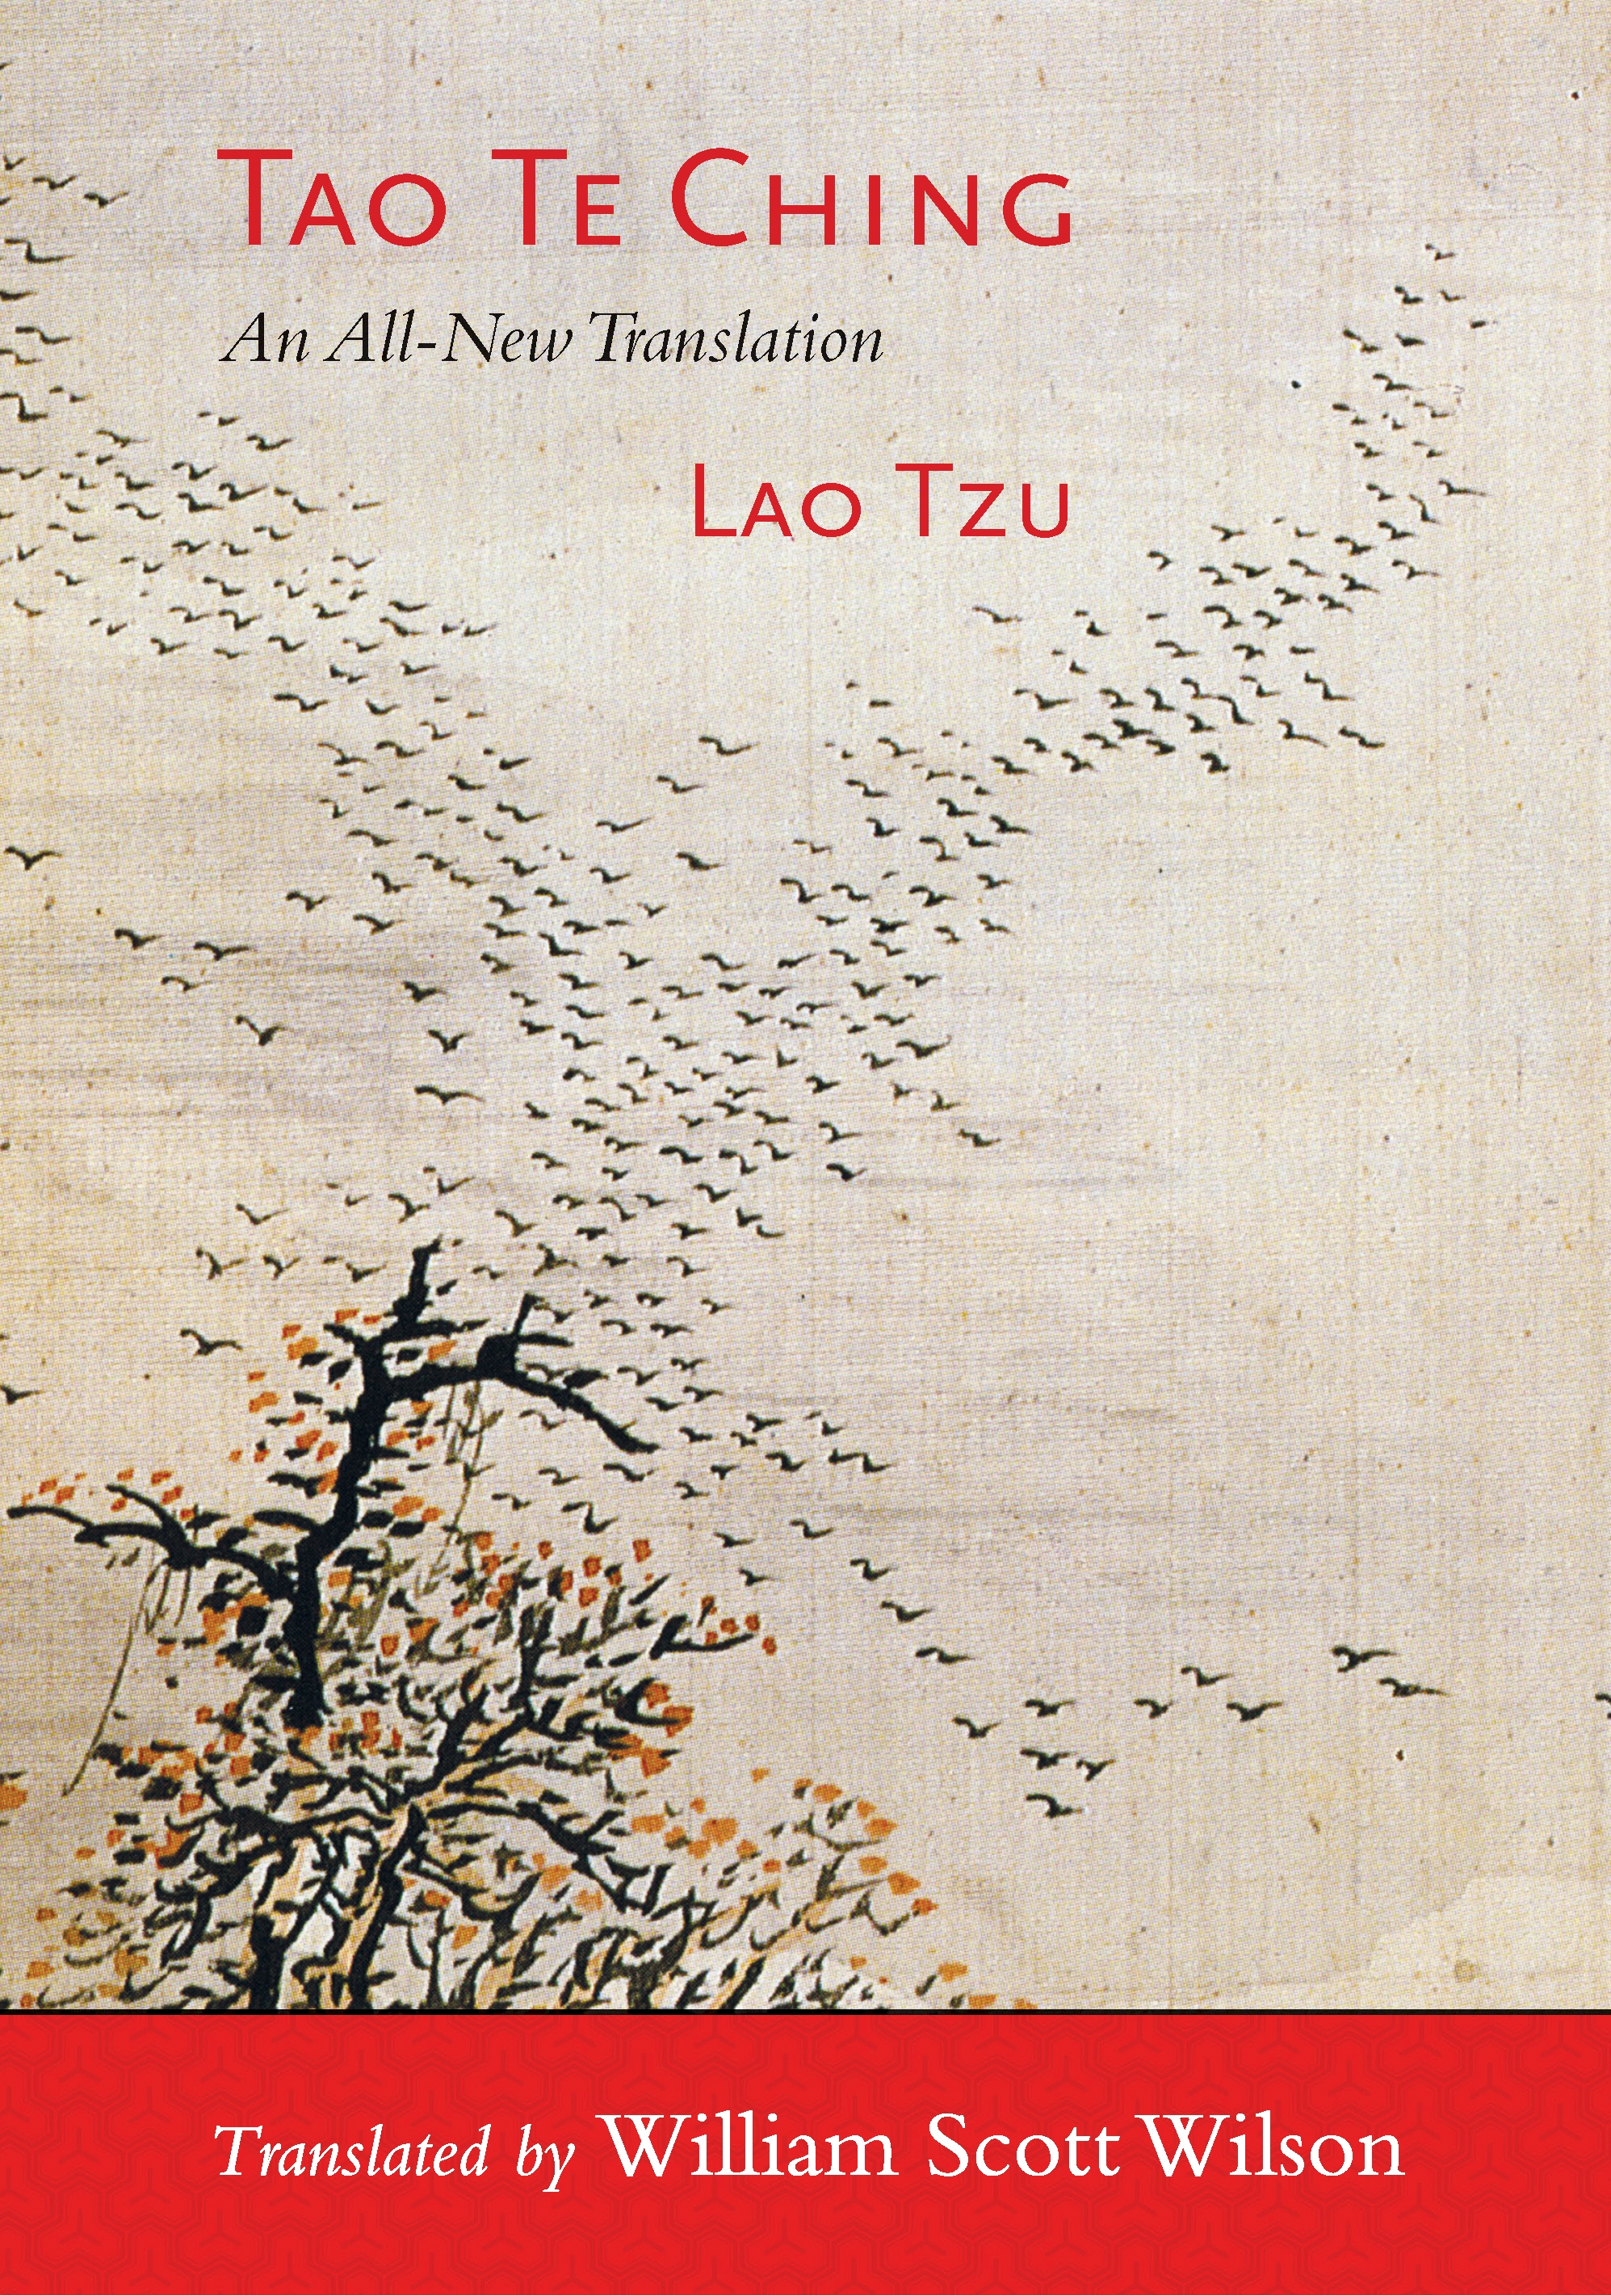 tao te ching by lao tzu penguin books  tao te ching